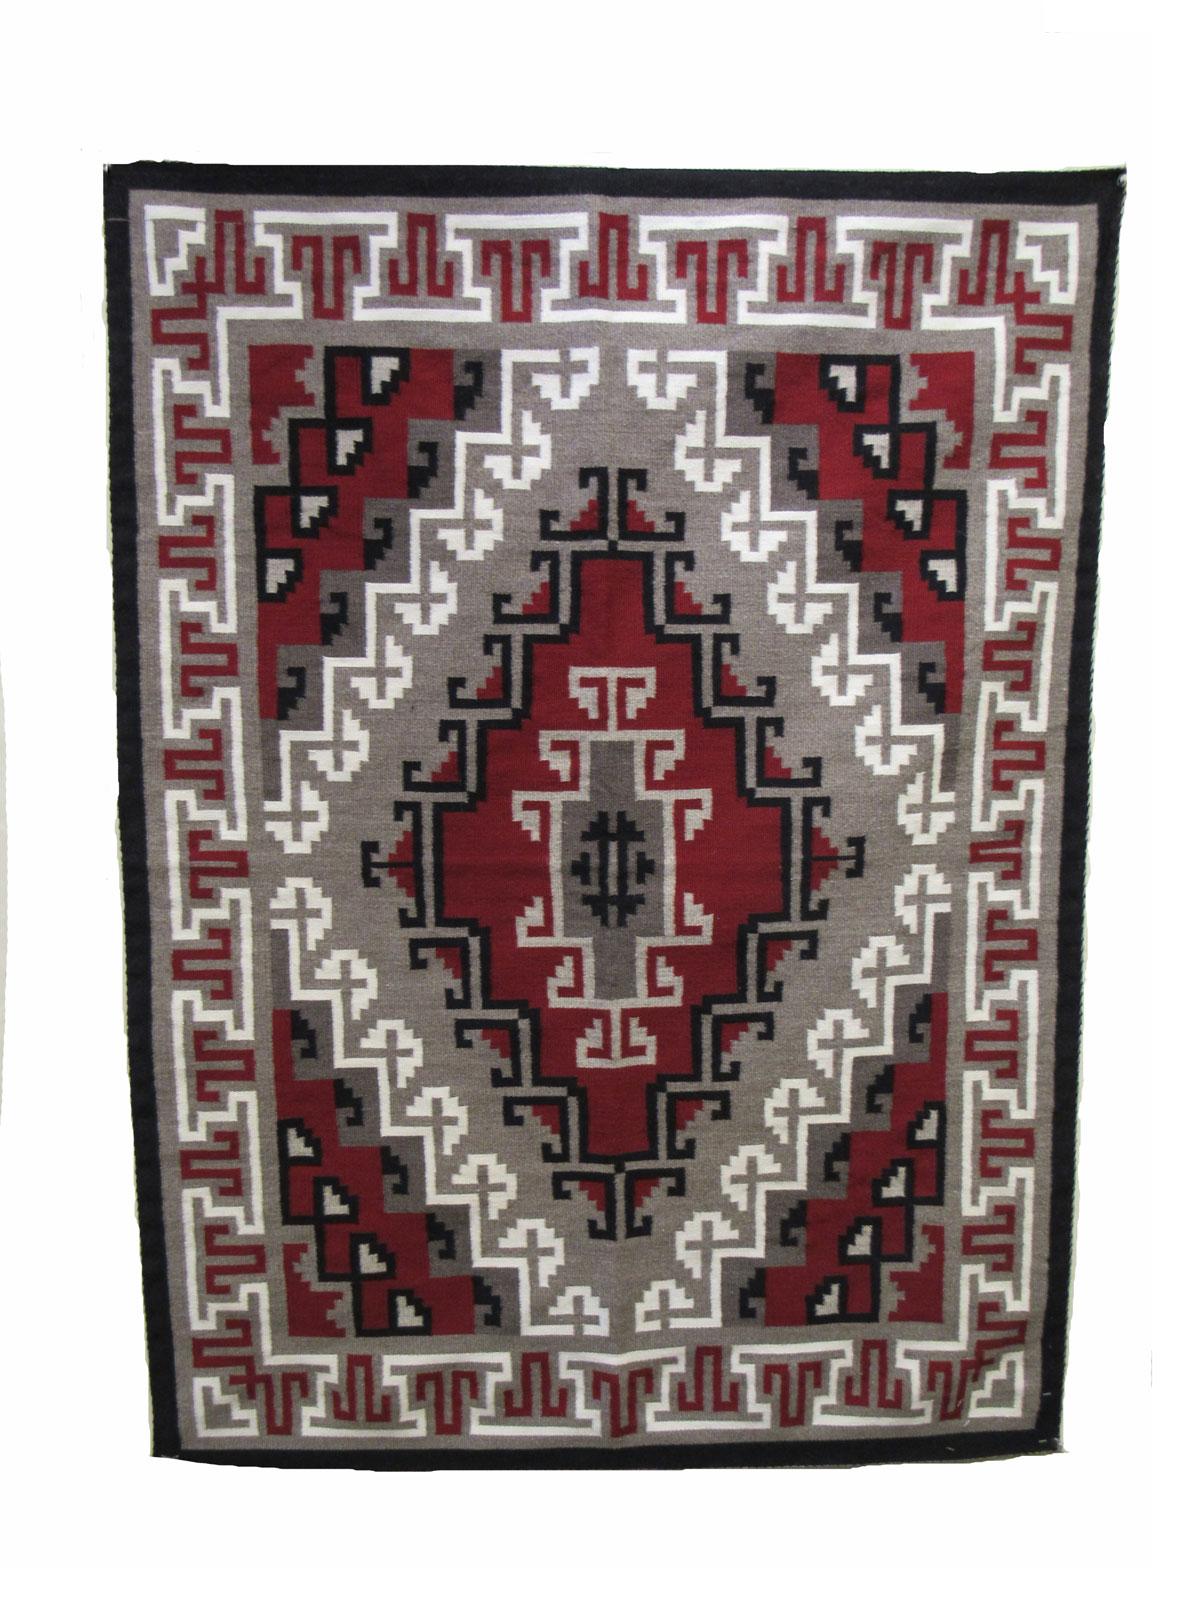 Ganado/Klagetoh Navajo Weaving